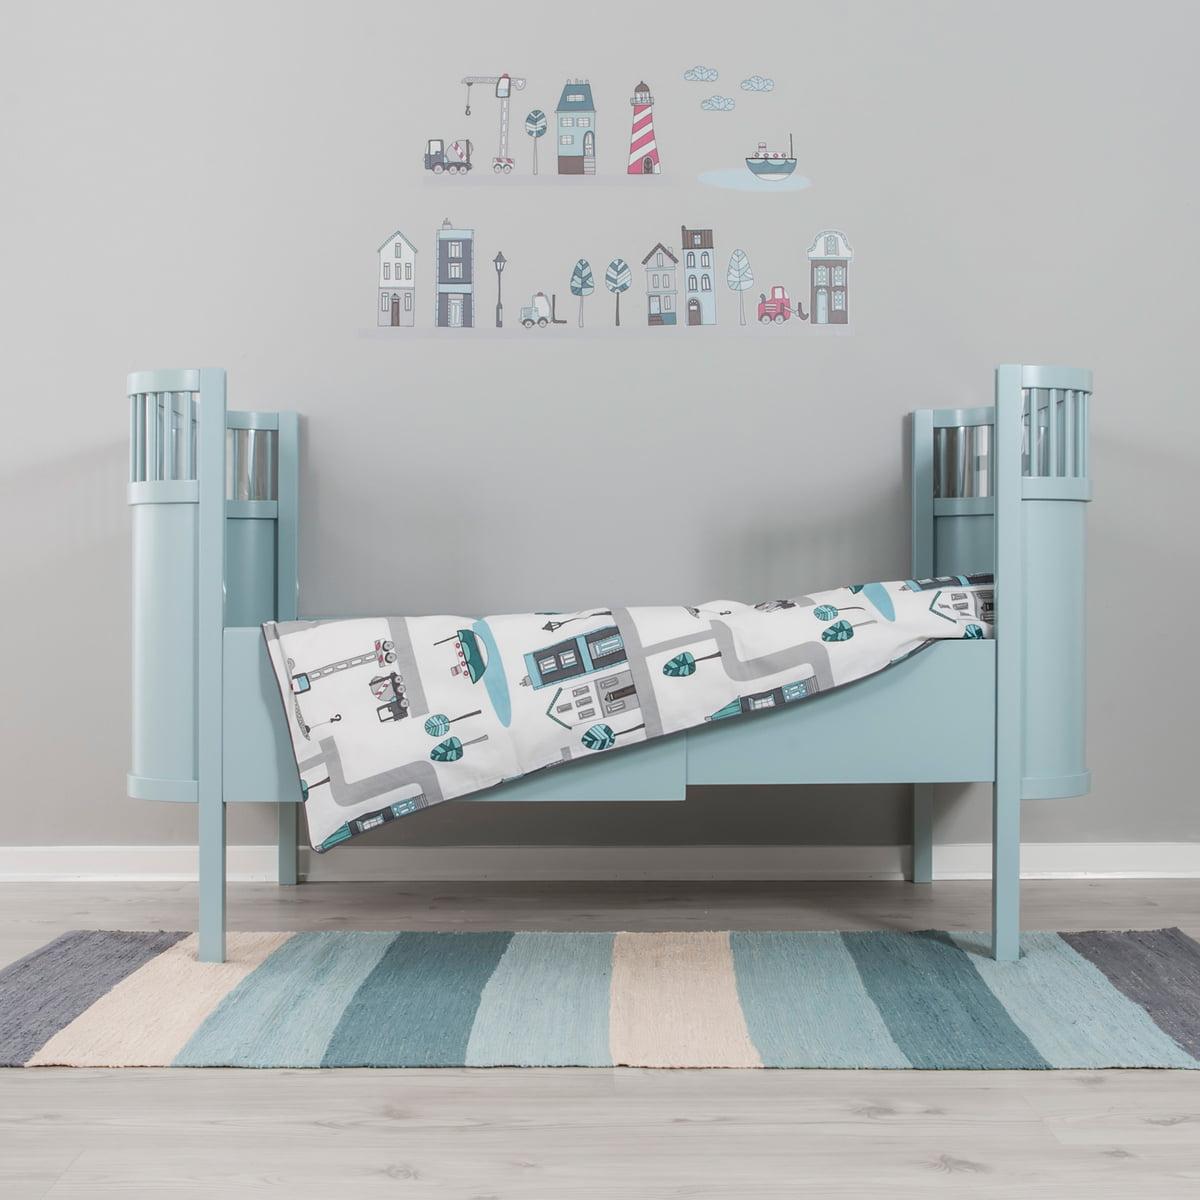 baby bed linen village by sebra at the shop. Black Bedroom Furniture Sets. Home Design Ideas